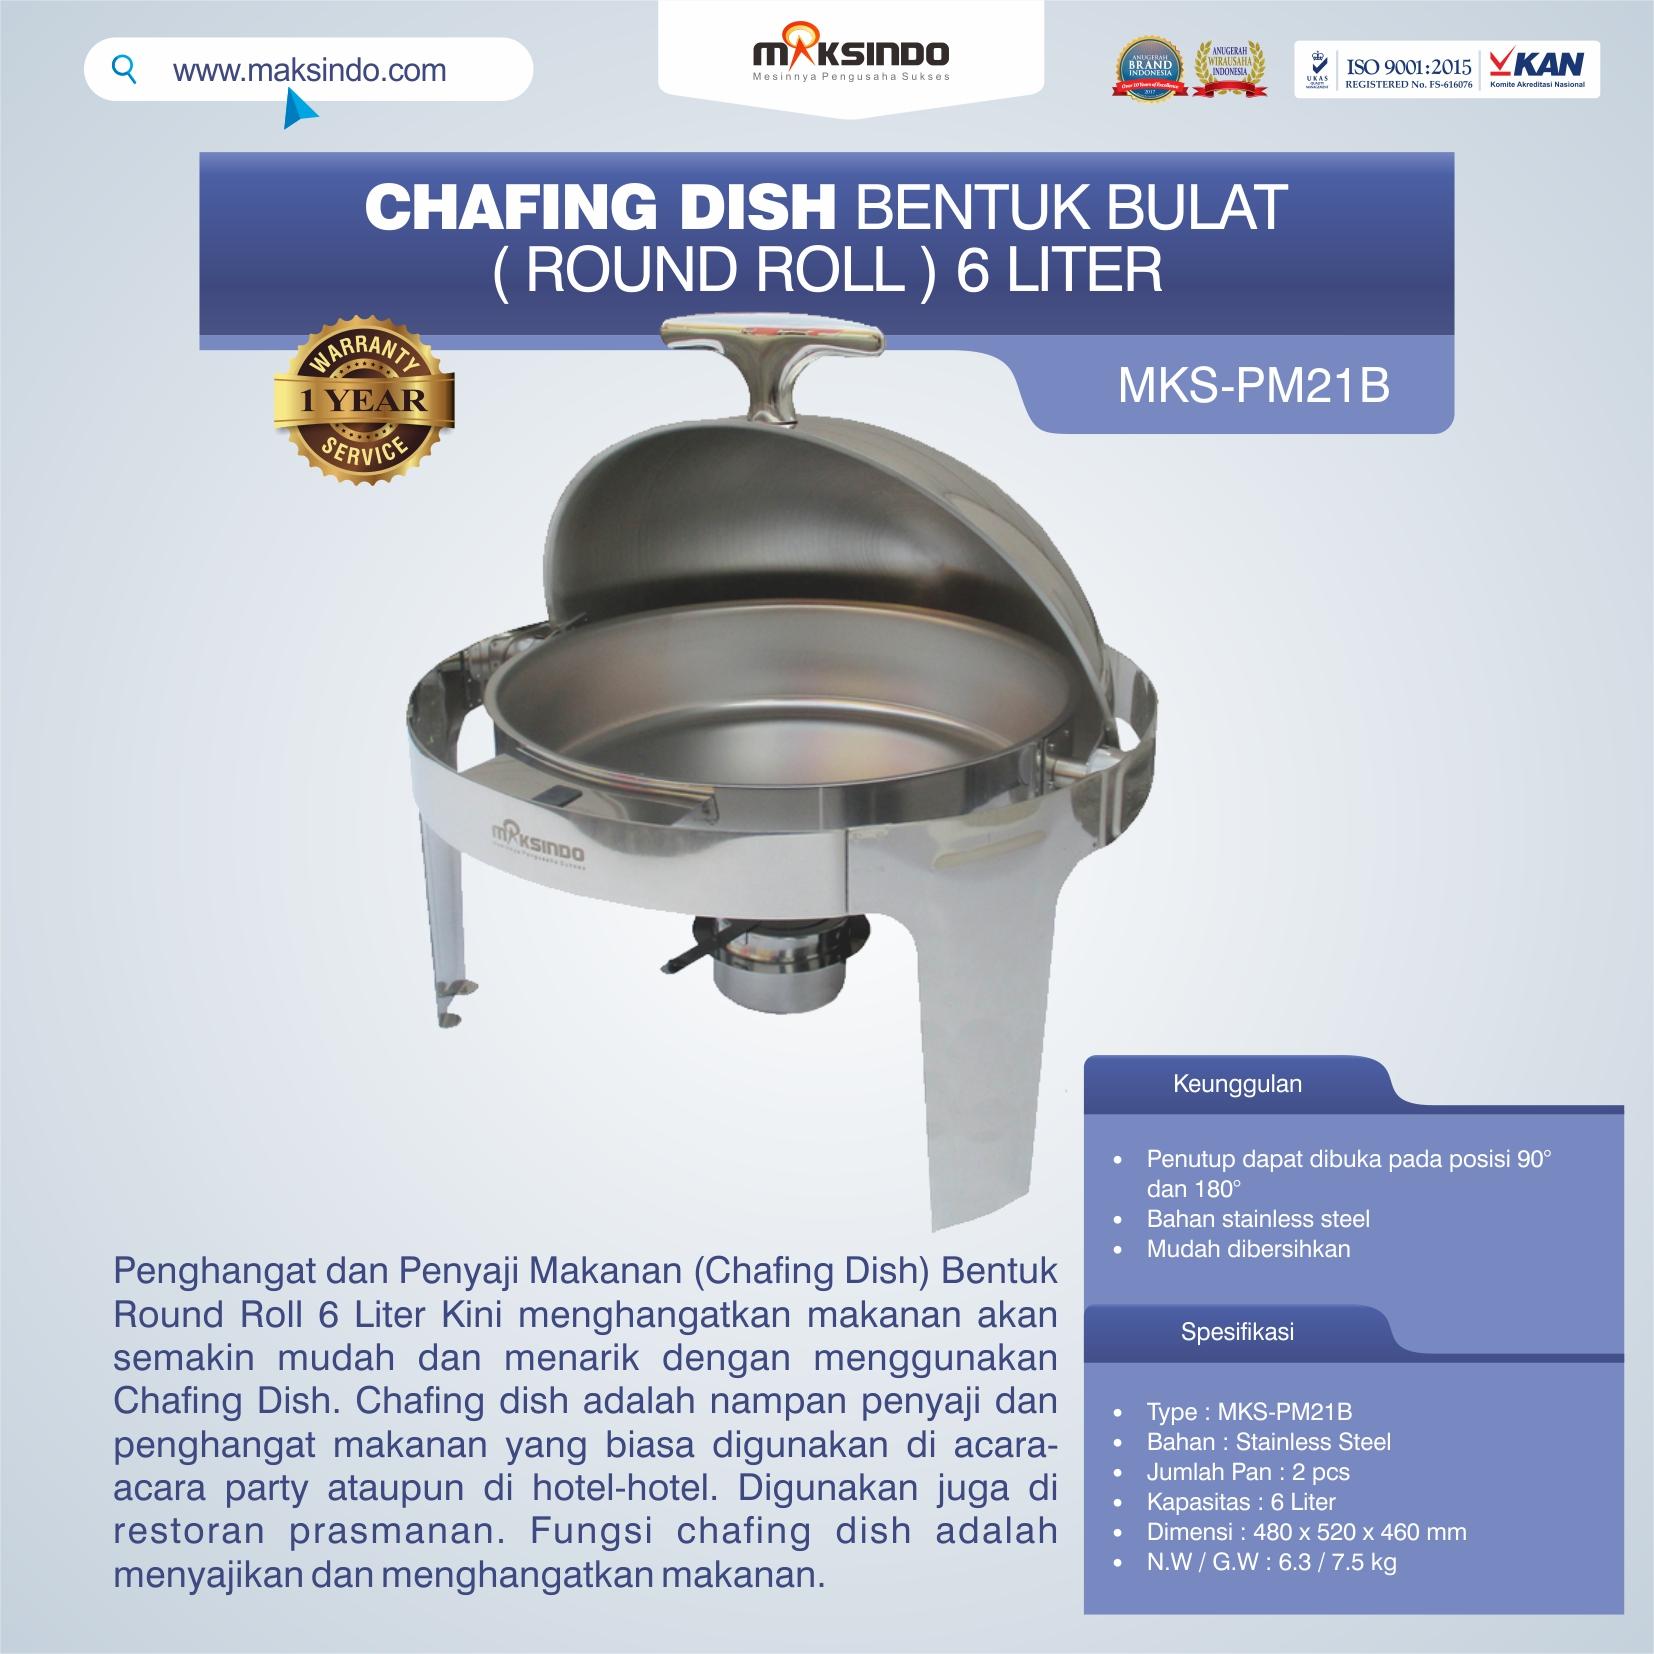 Jual Chafing Dish Bentuk Bulat (Round Roll) 6 Liter di Makassar